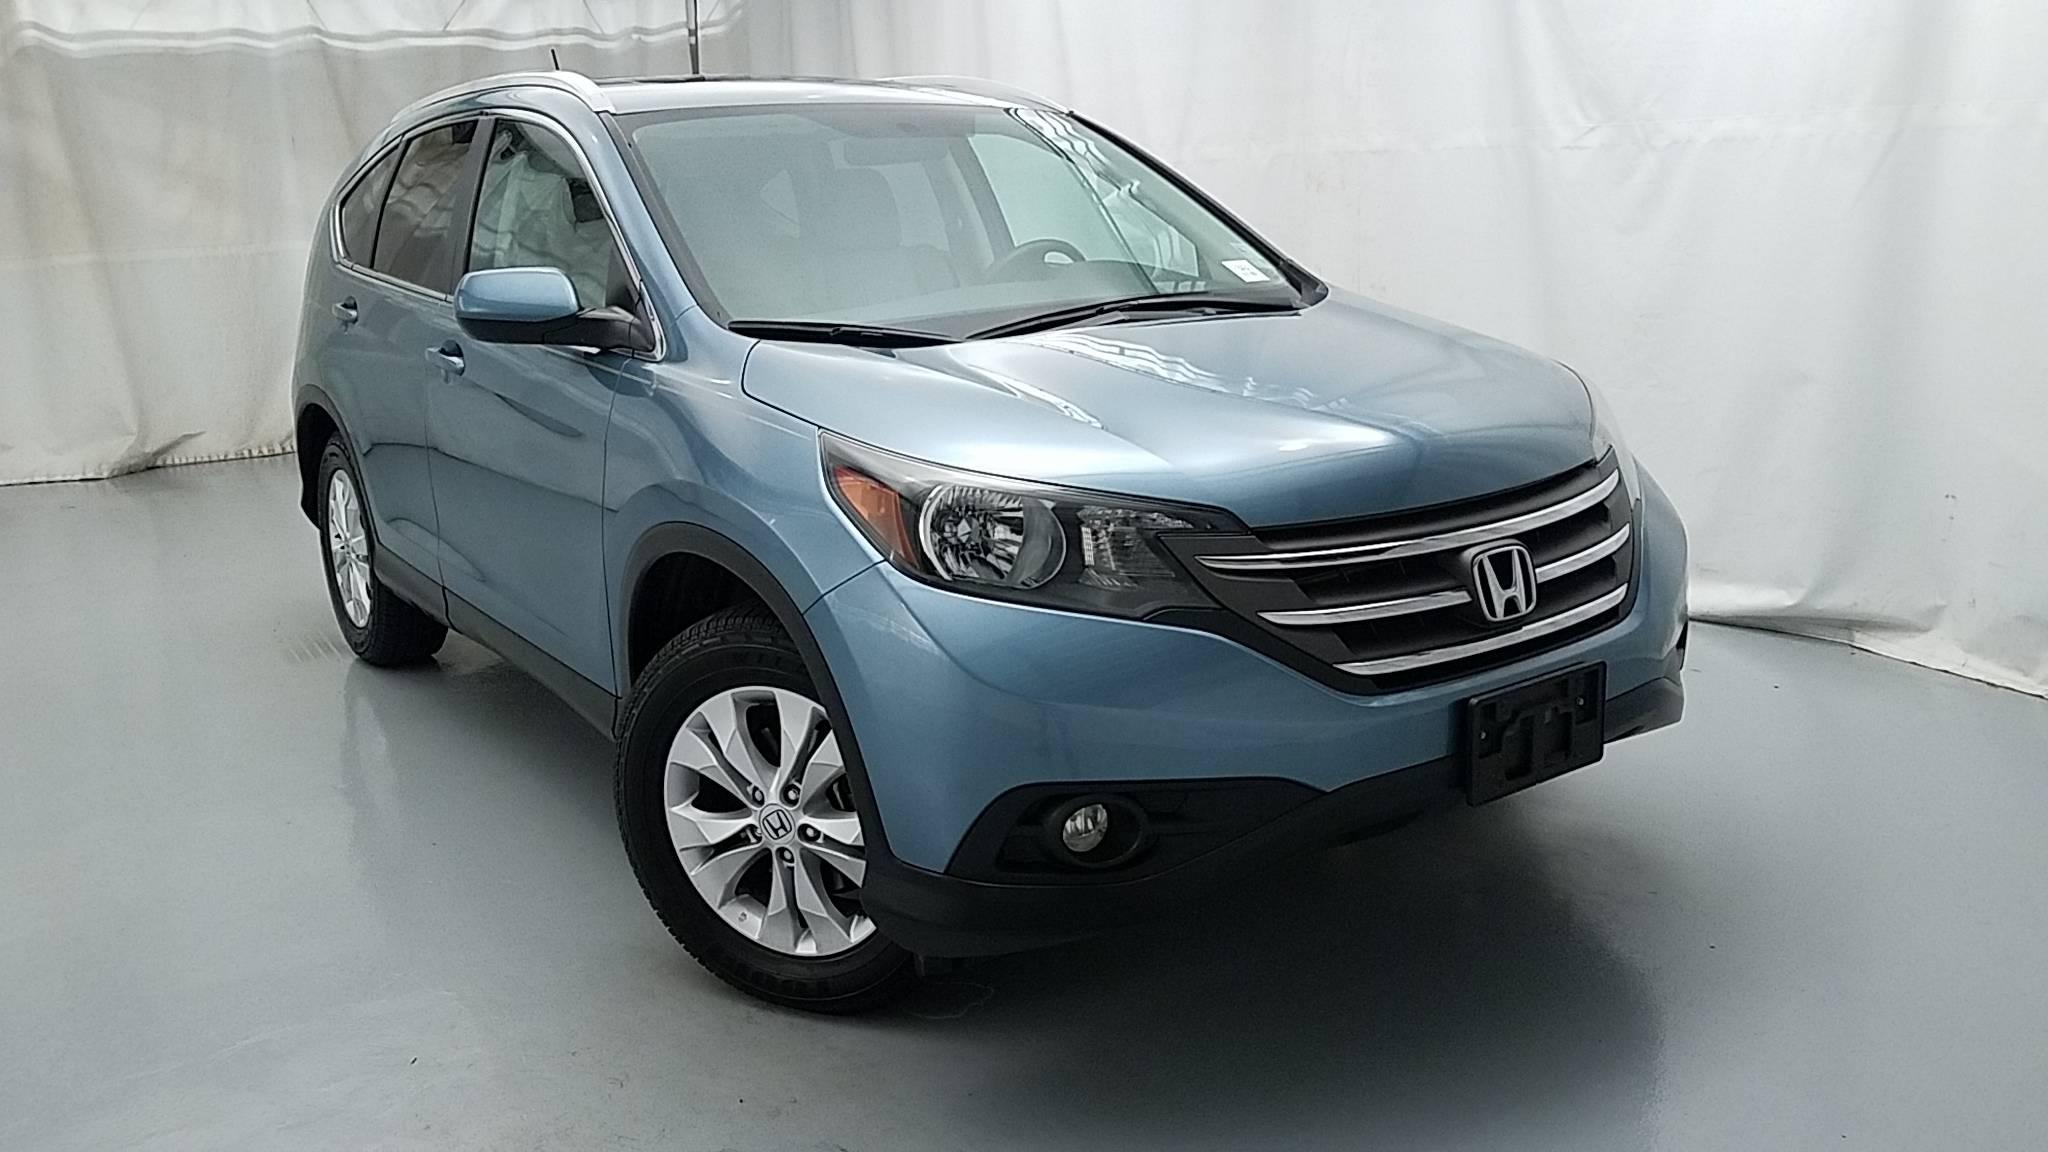 Used Honda Civic Sedan Vehicles for Sale near Hammond New Orleans